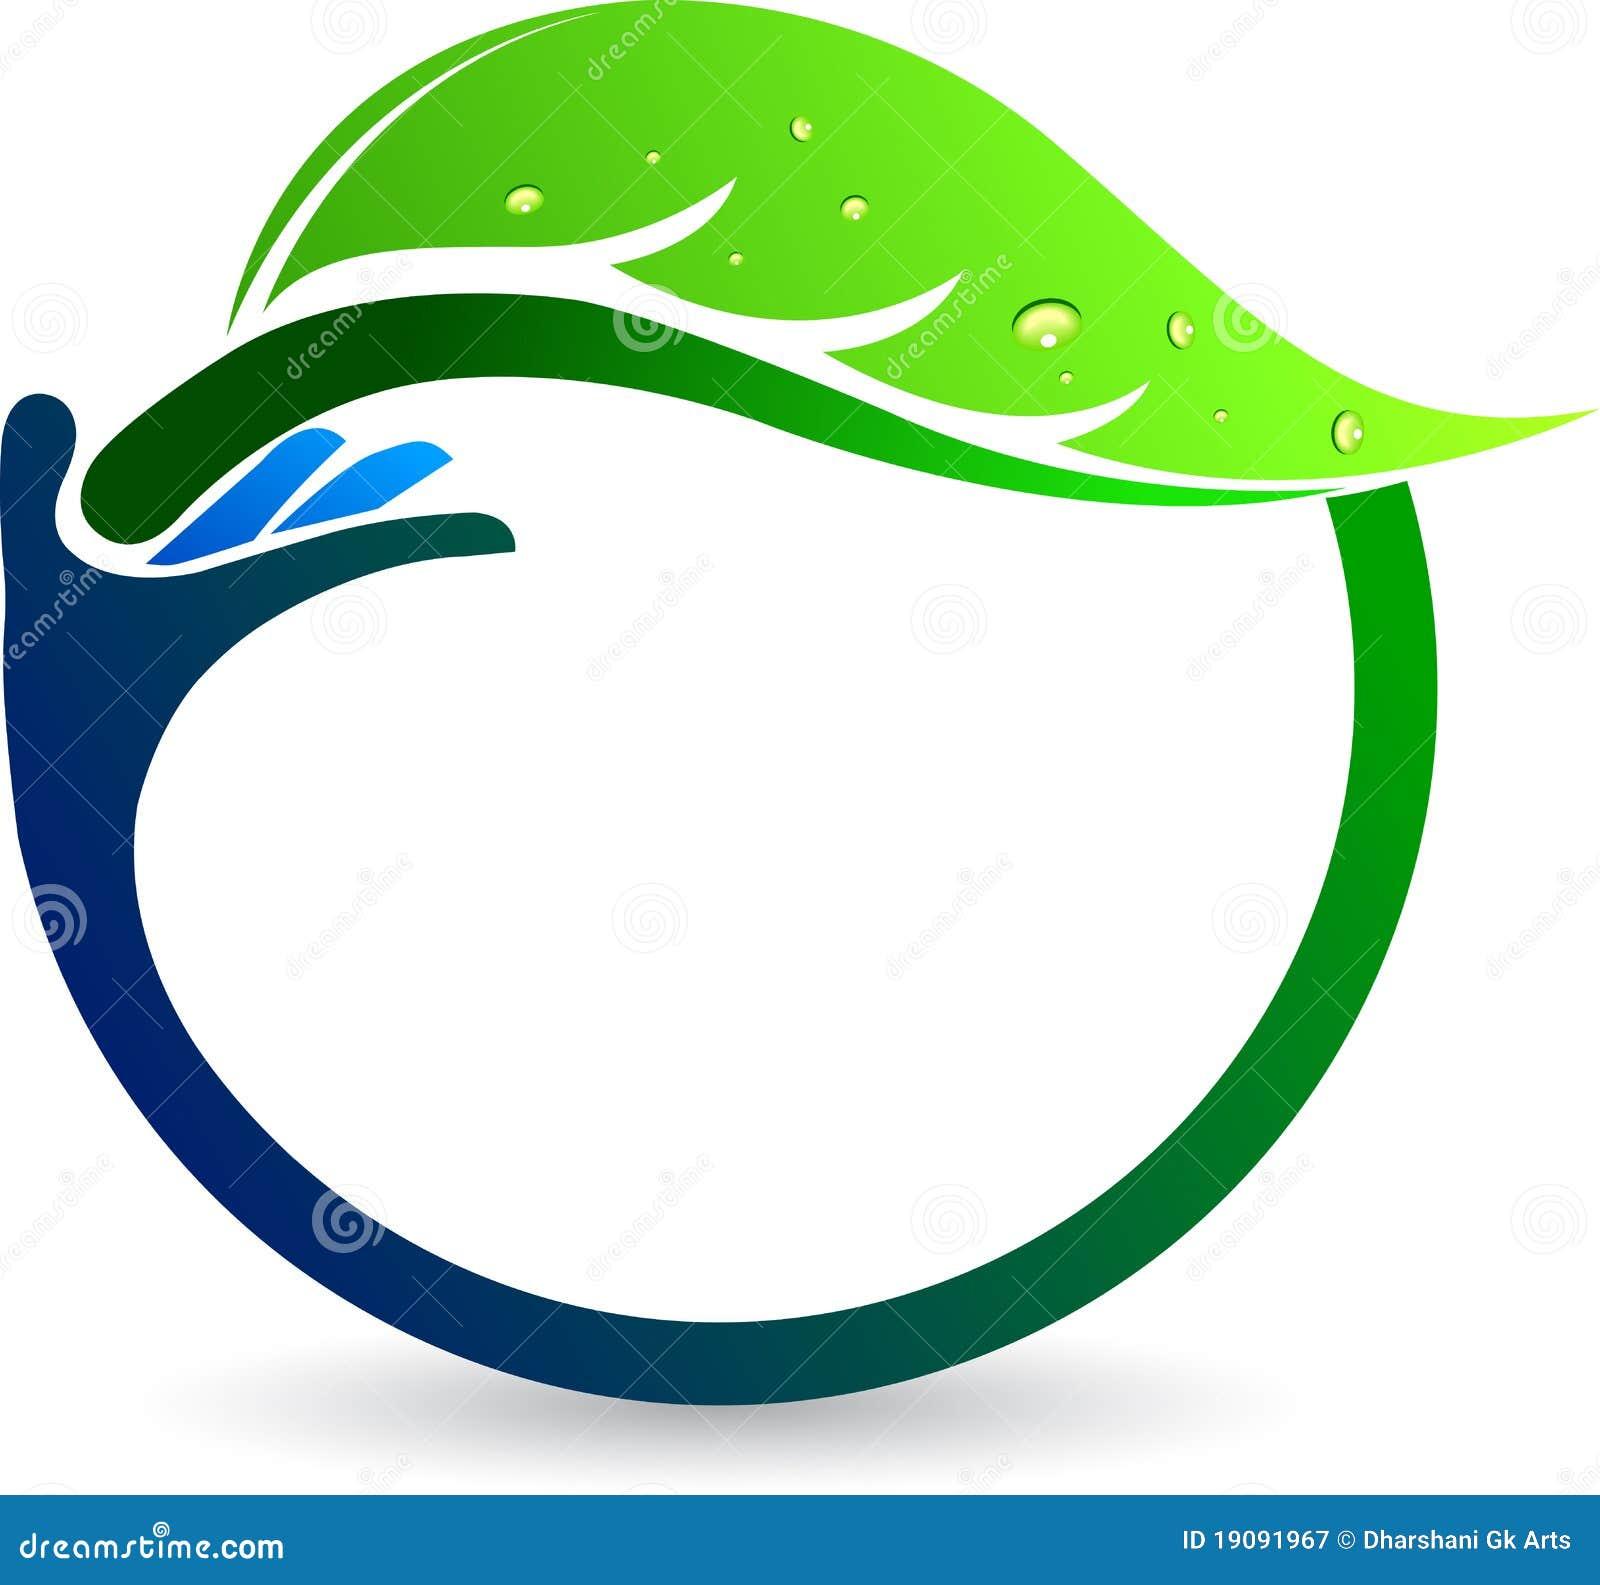 Hand Leaf Logo Royalty Free Stock Photography Image